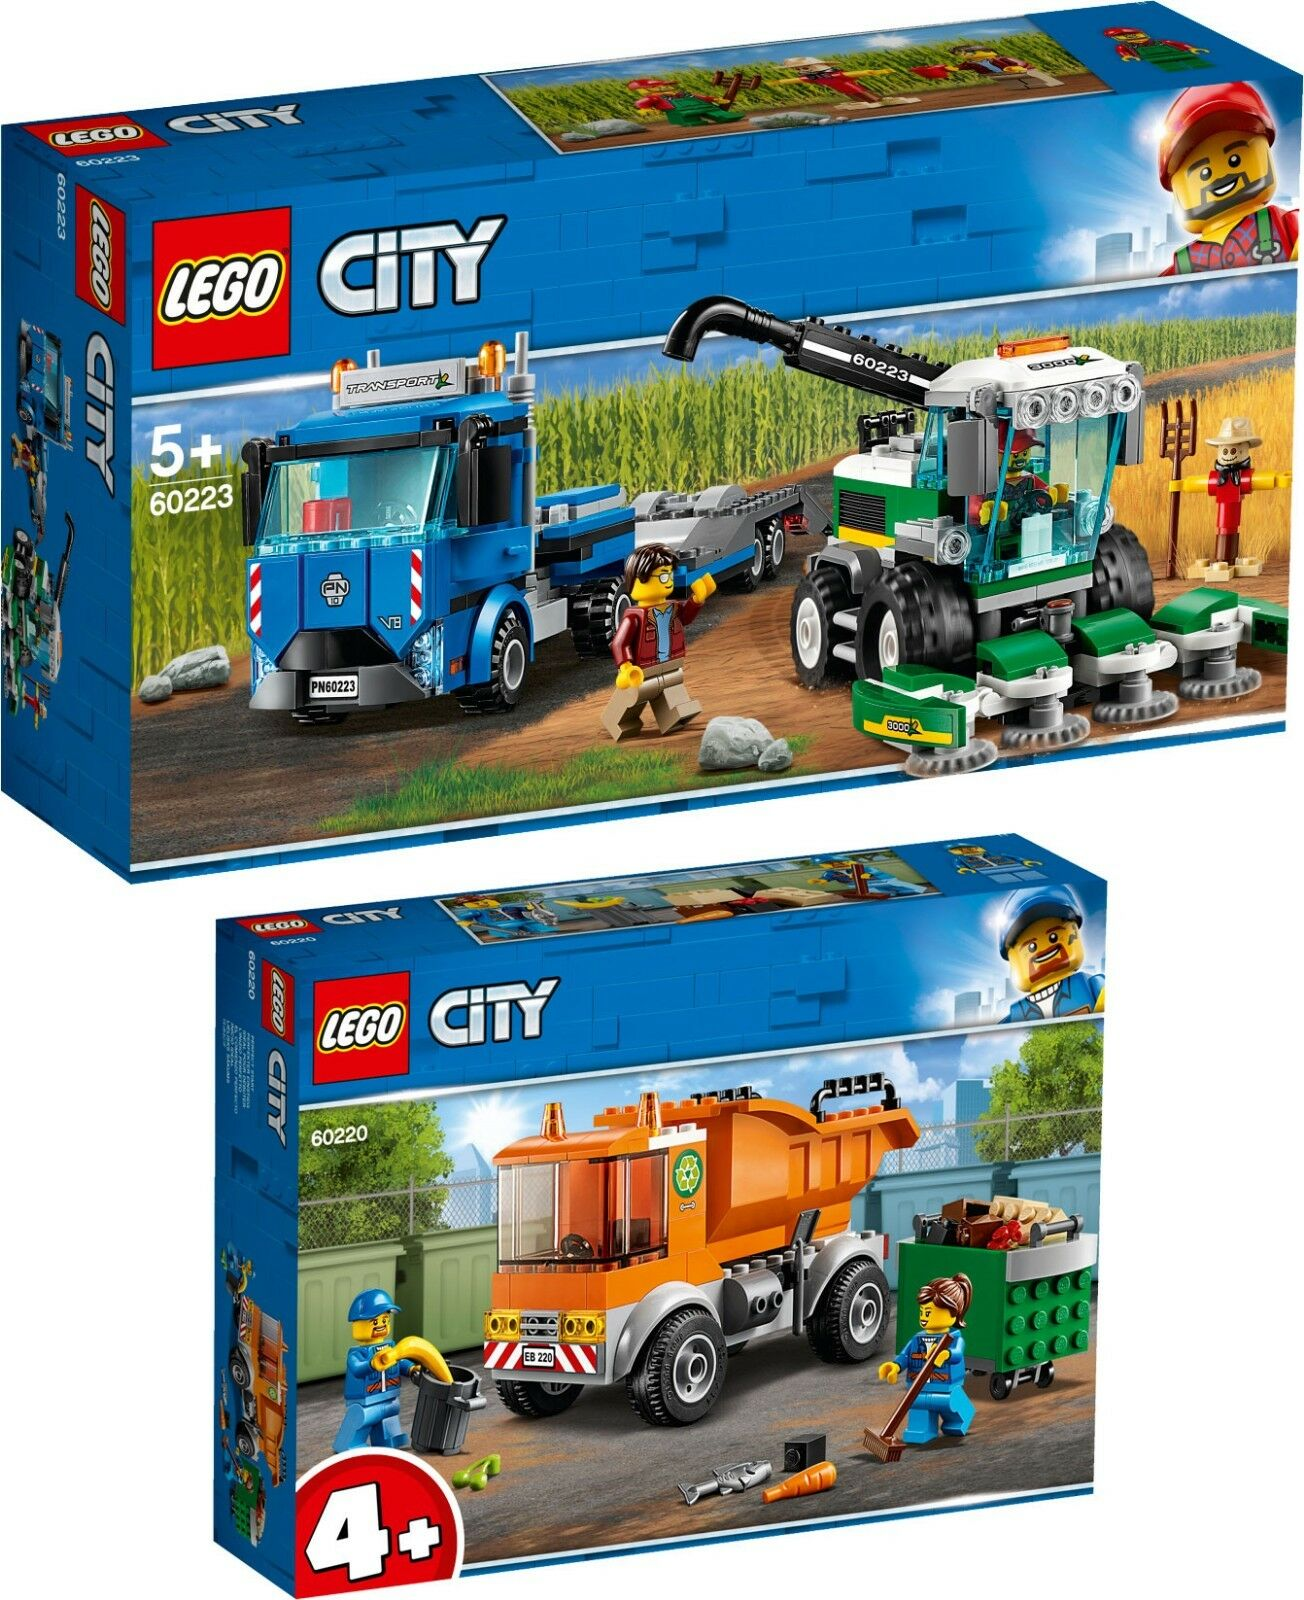 Lego ® City 60223 60220 Transporter for Combine Harvester Garbage Collection N2 19